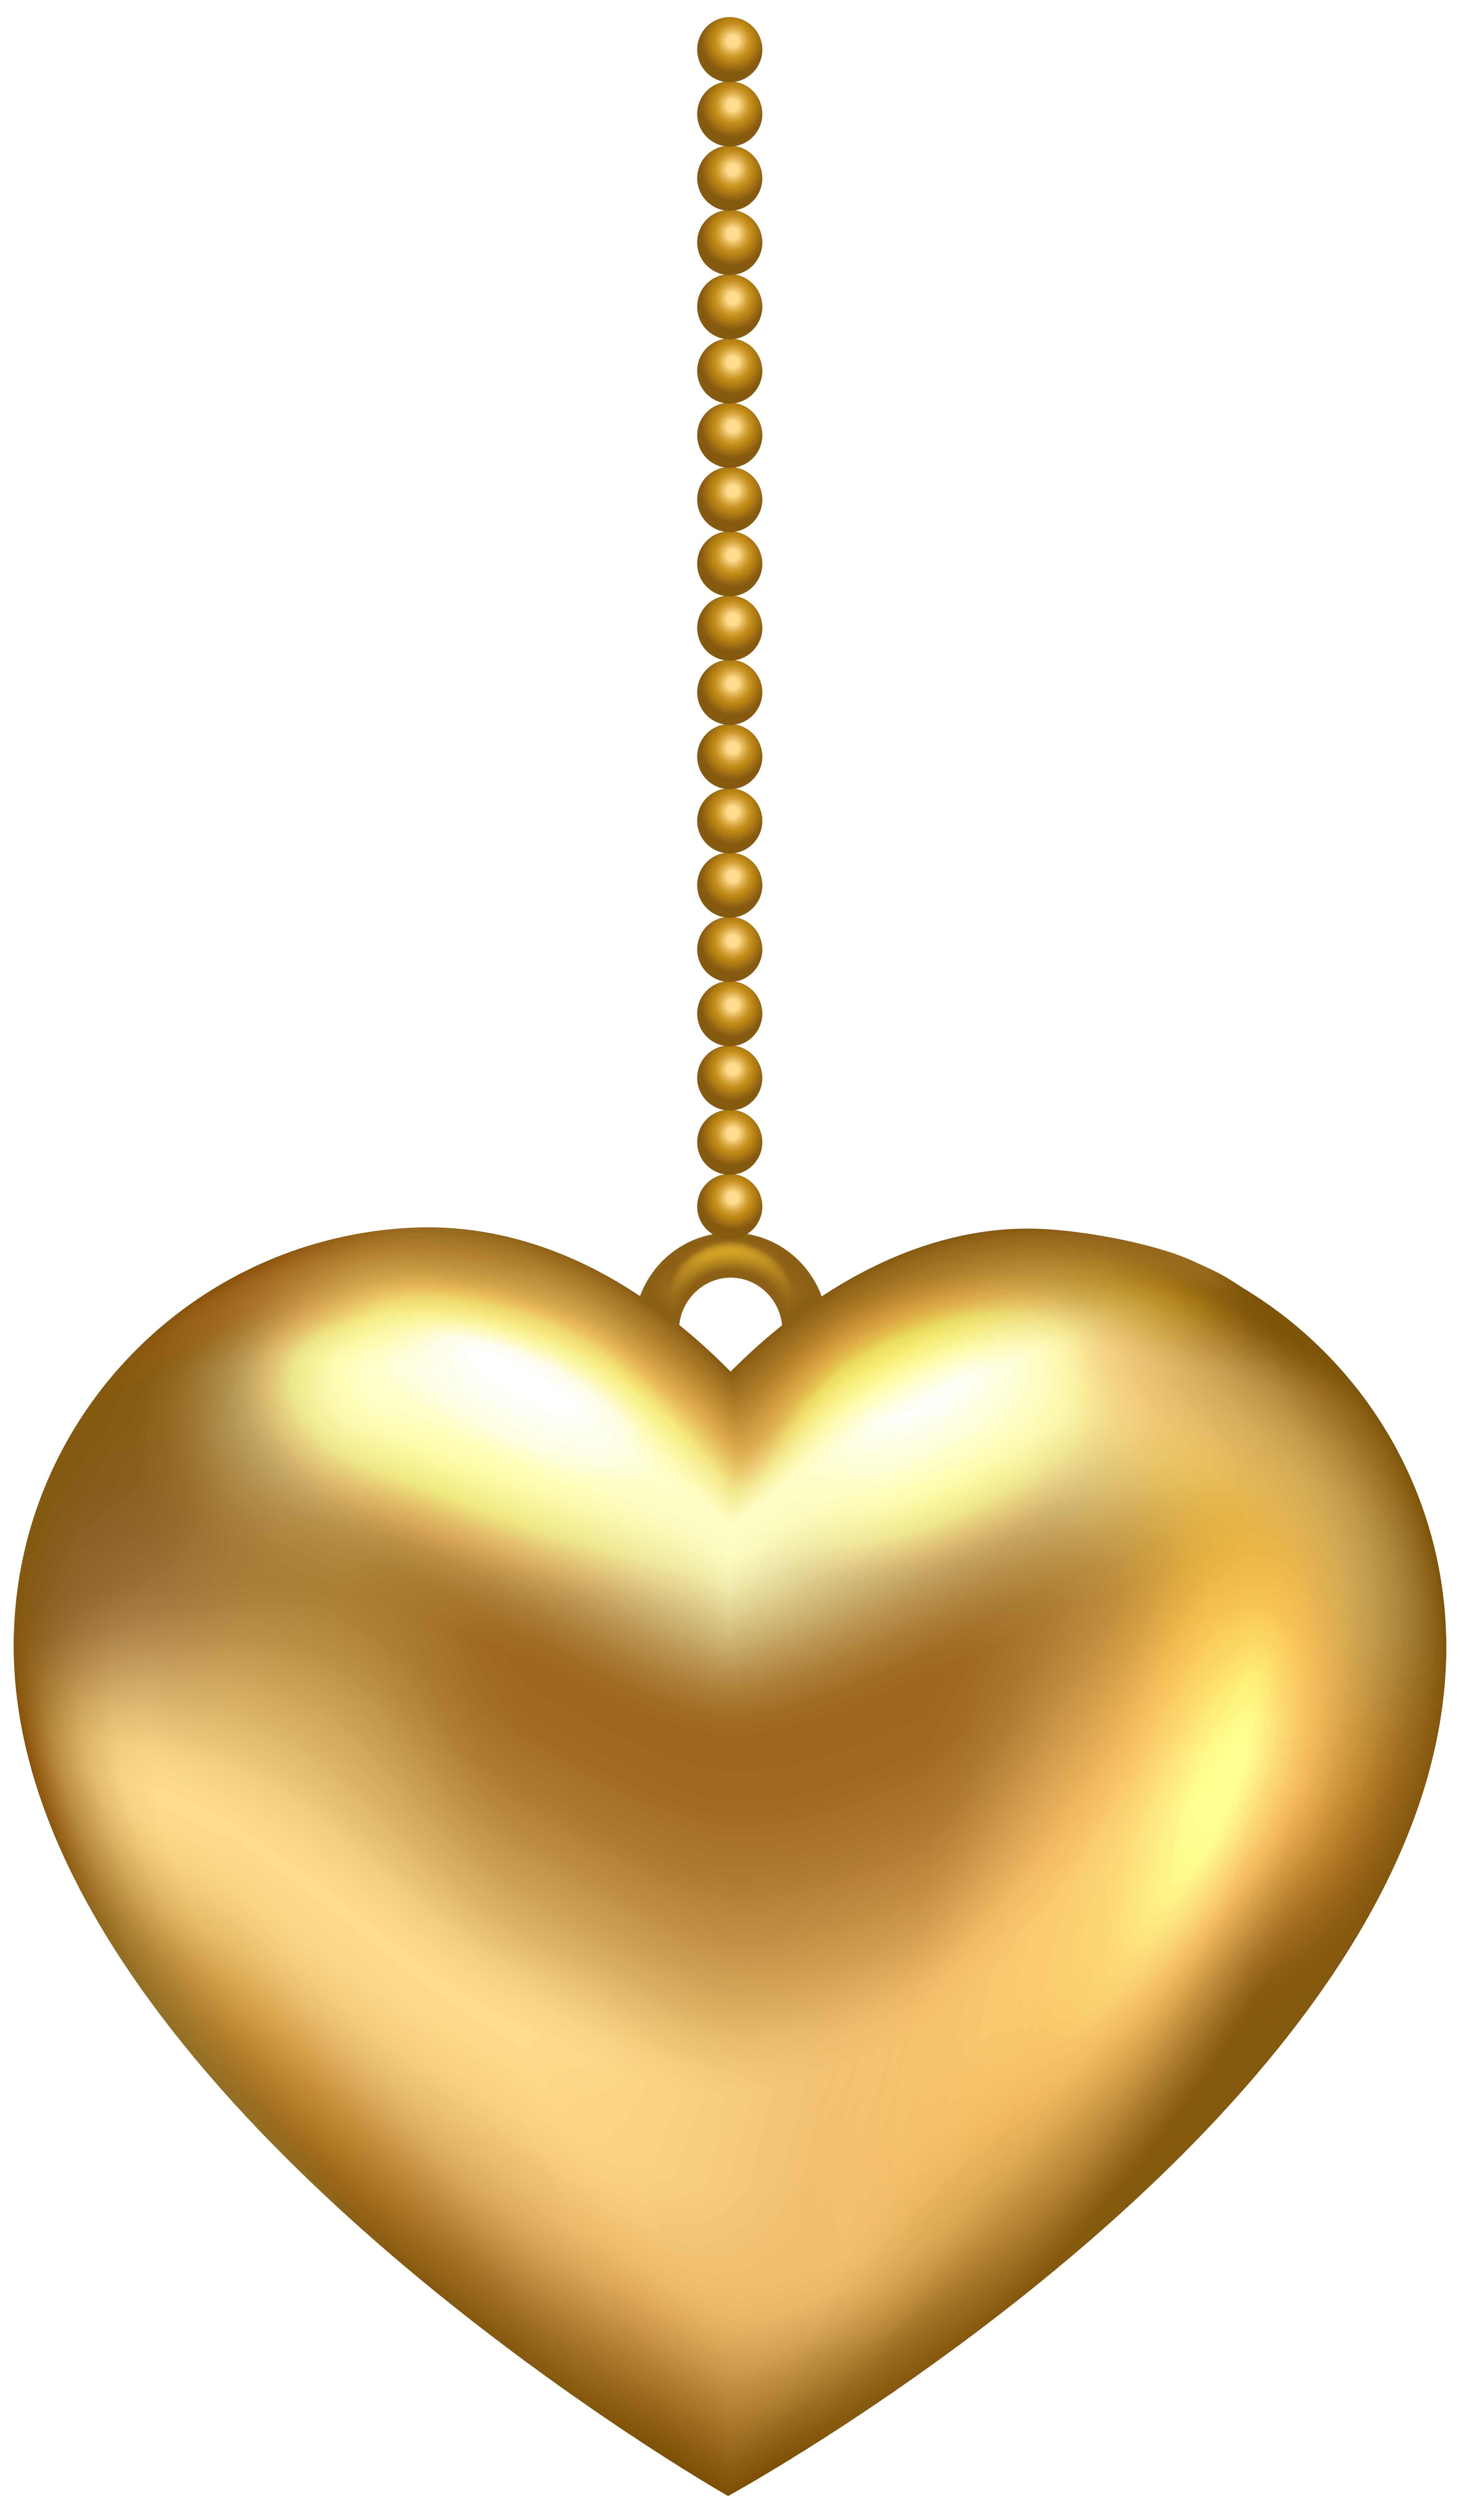 Golden heart clipart clip art stock Hanging Golden Heart PNG Clip Art Image   Gallery Yopriceville ... clip art stock